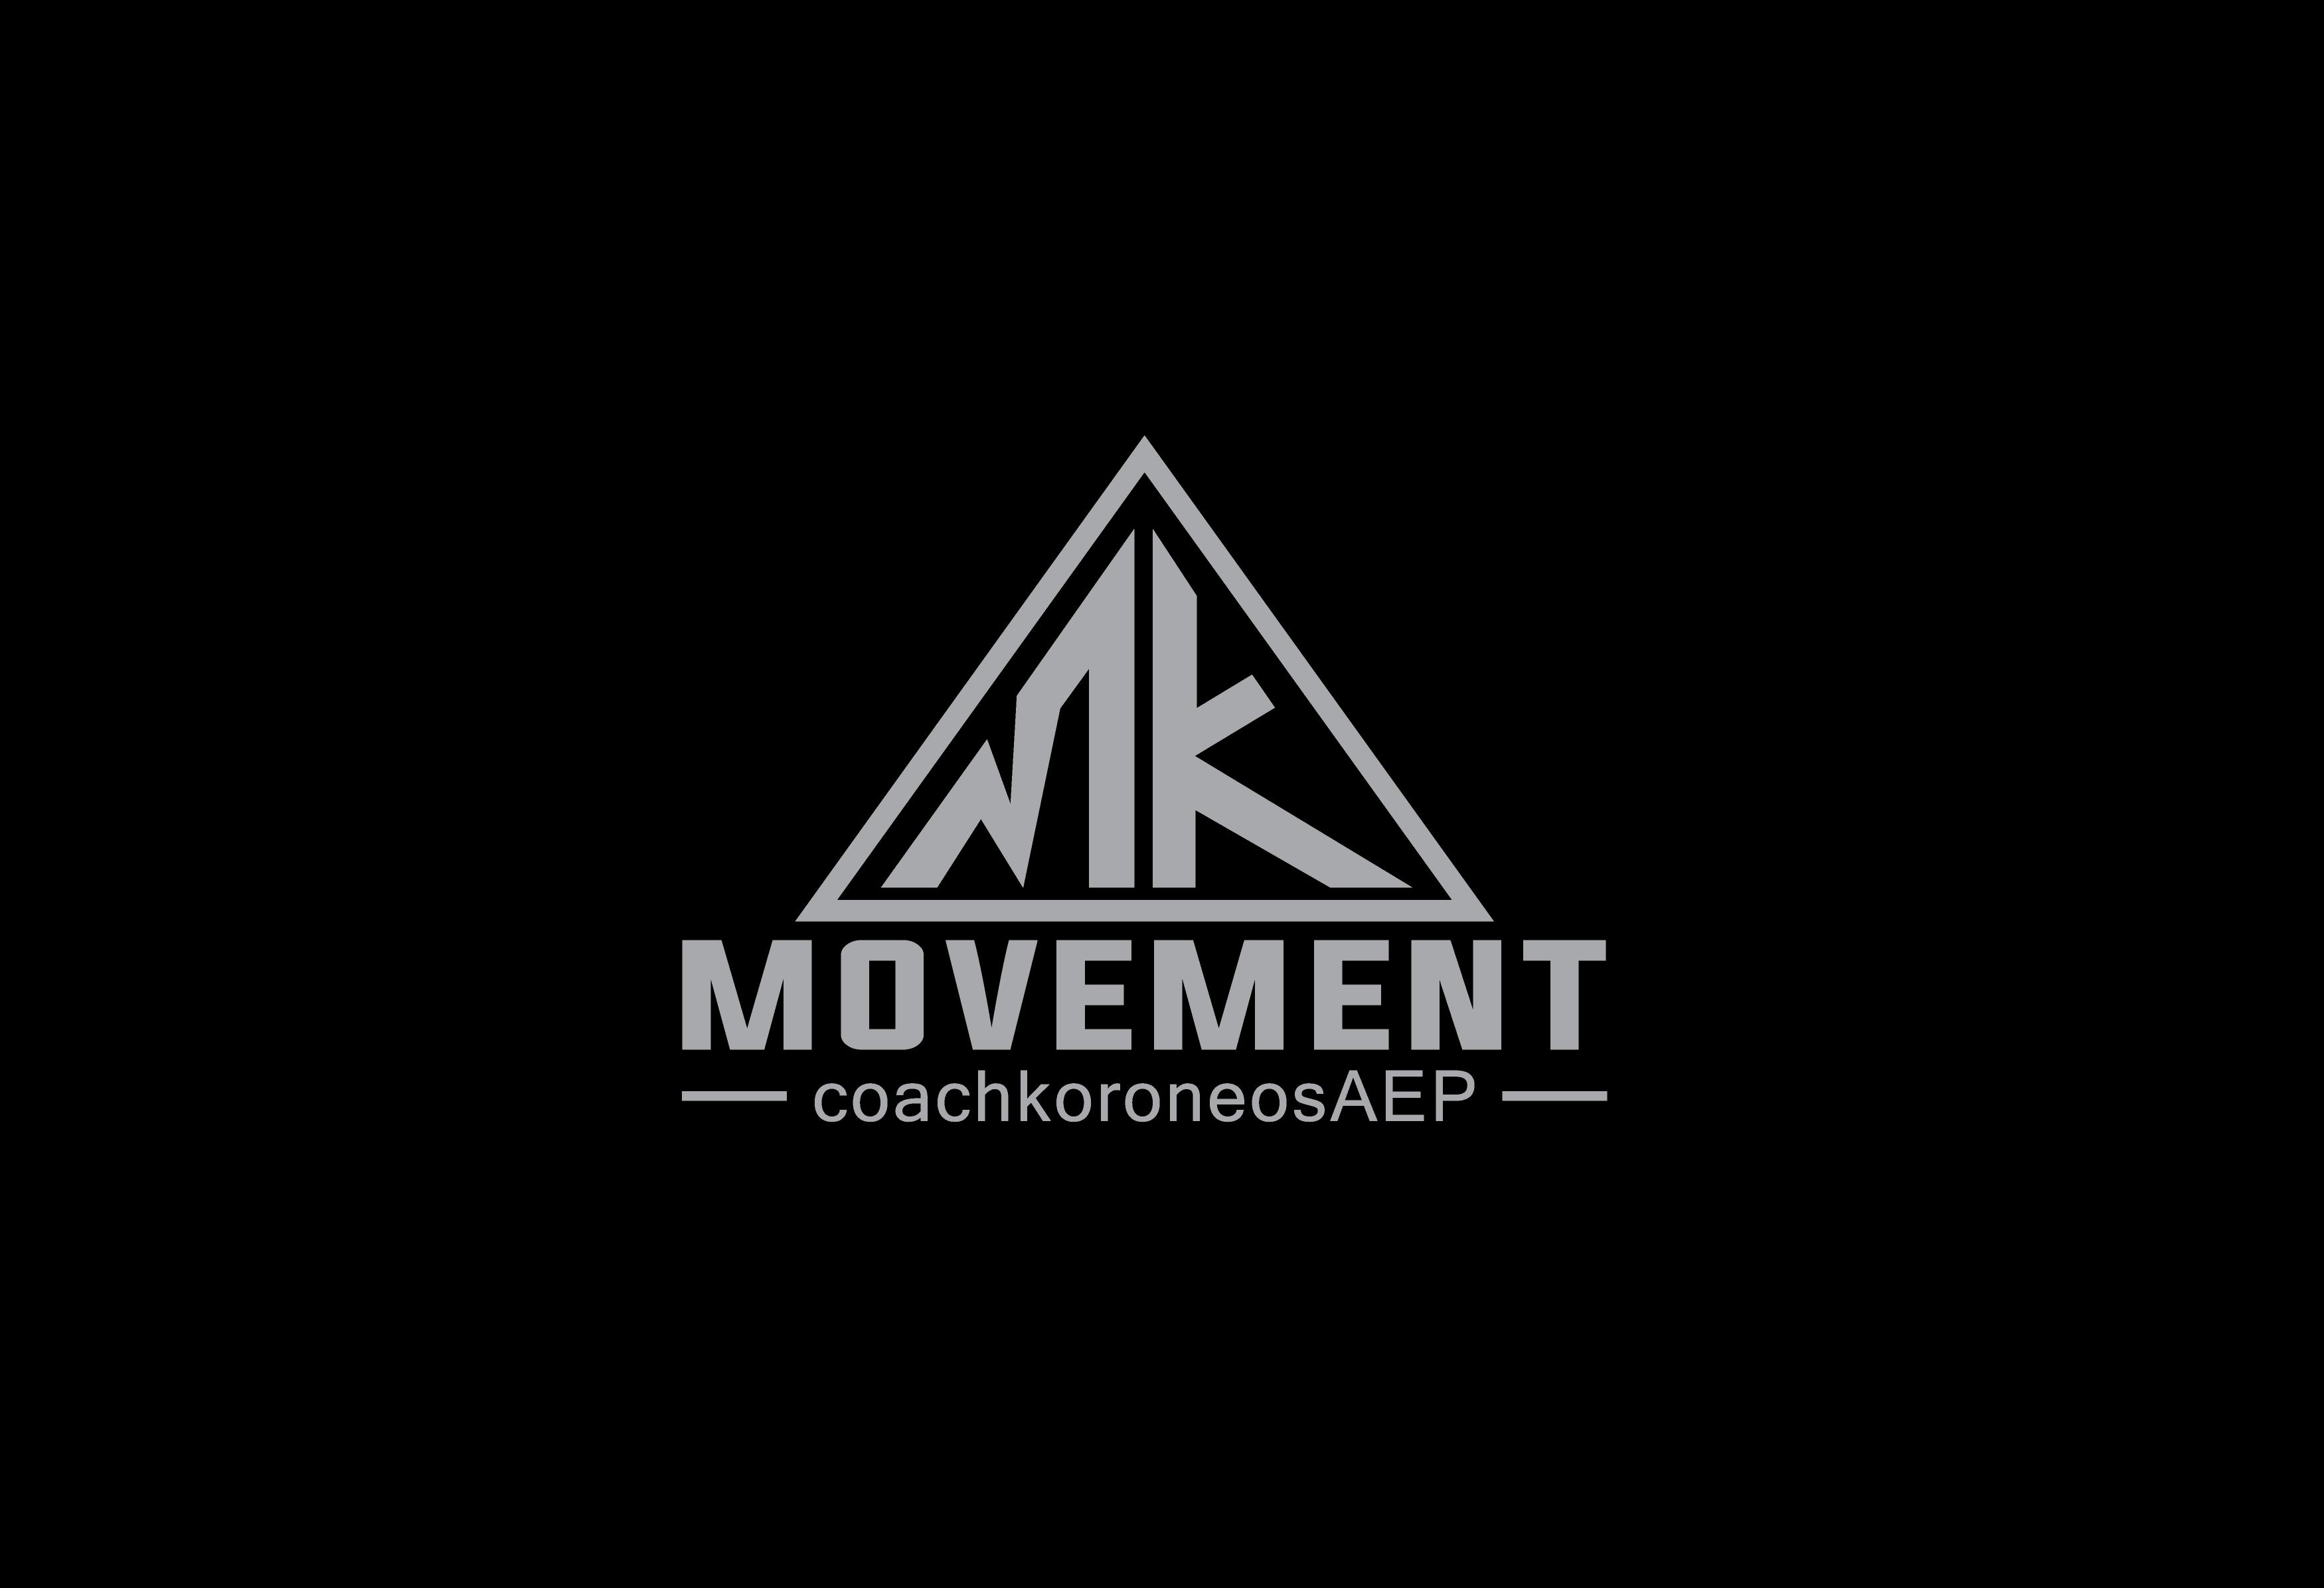 MK MOVEMENT logo 1